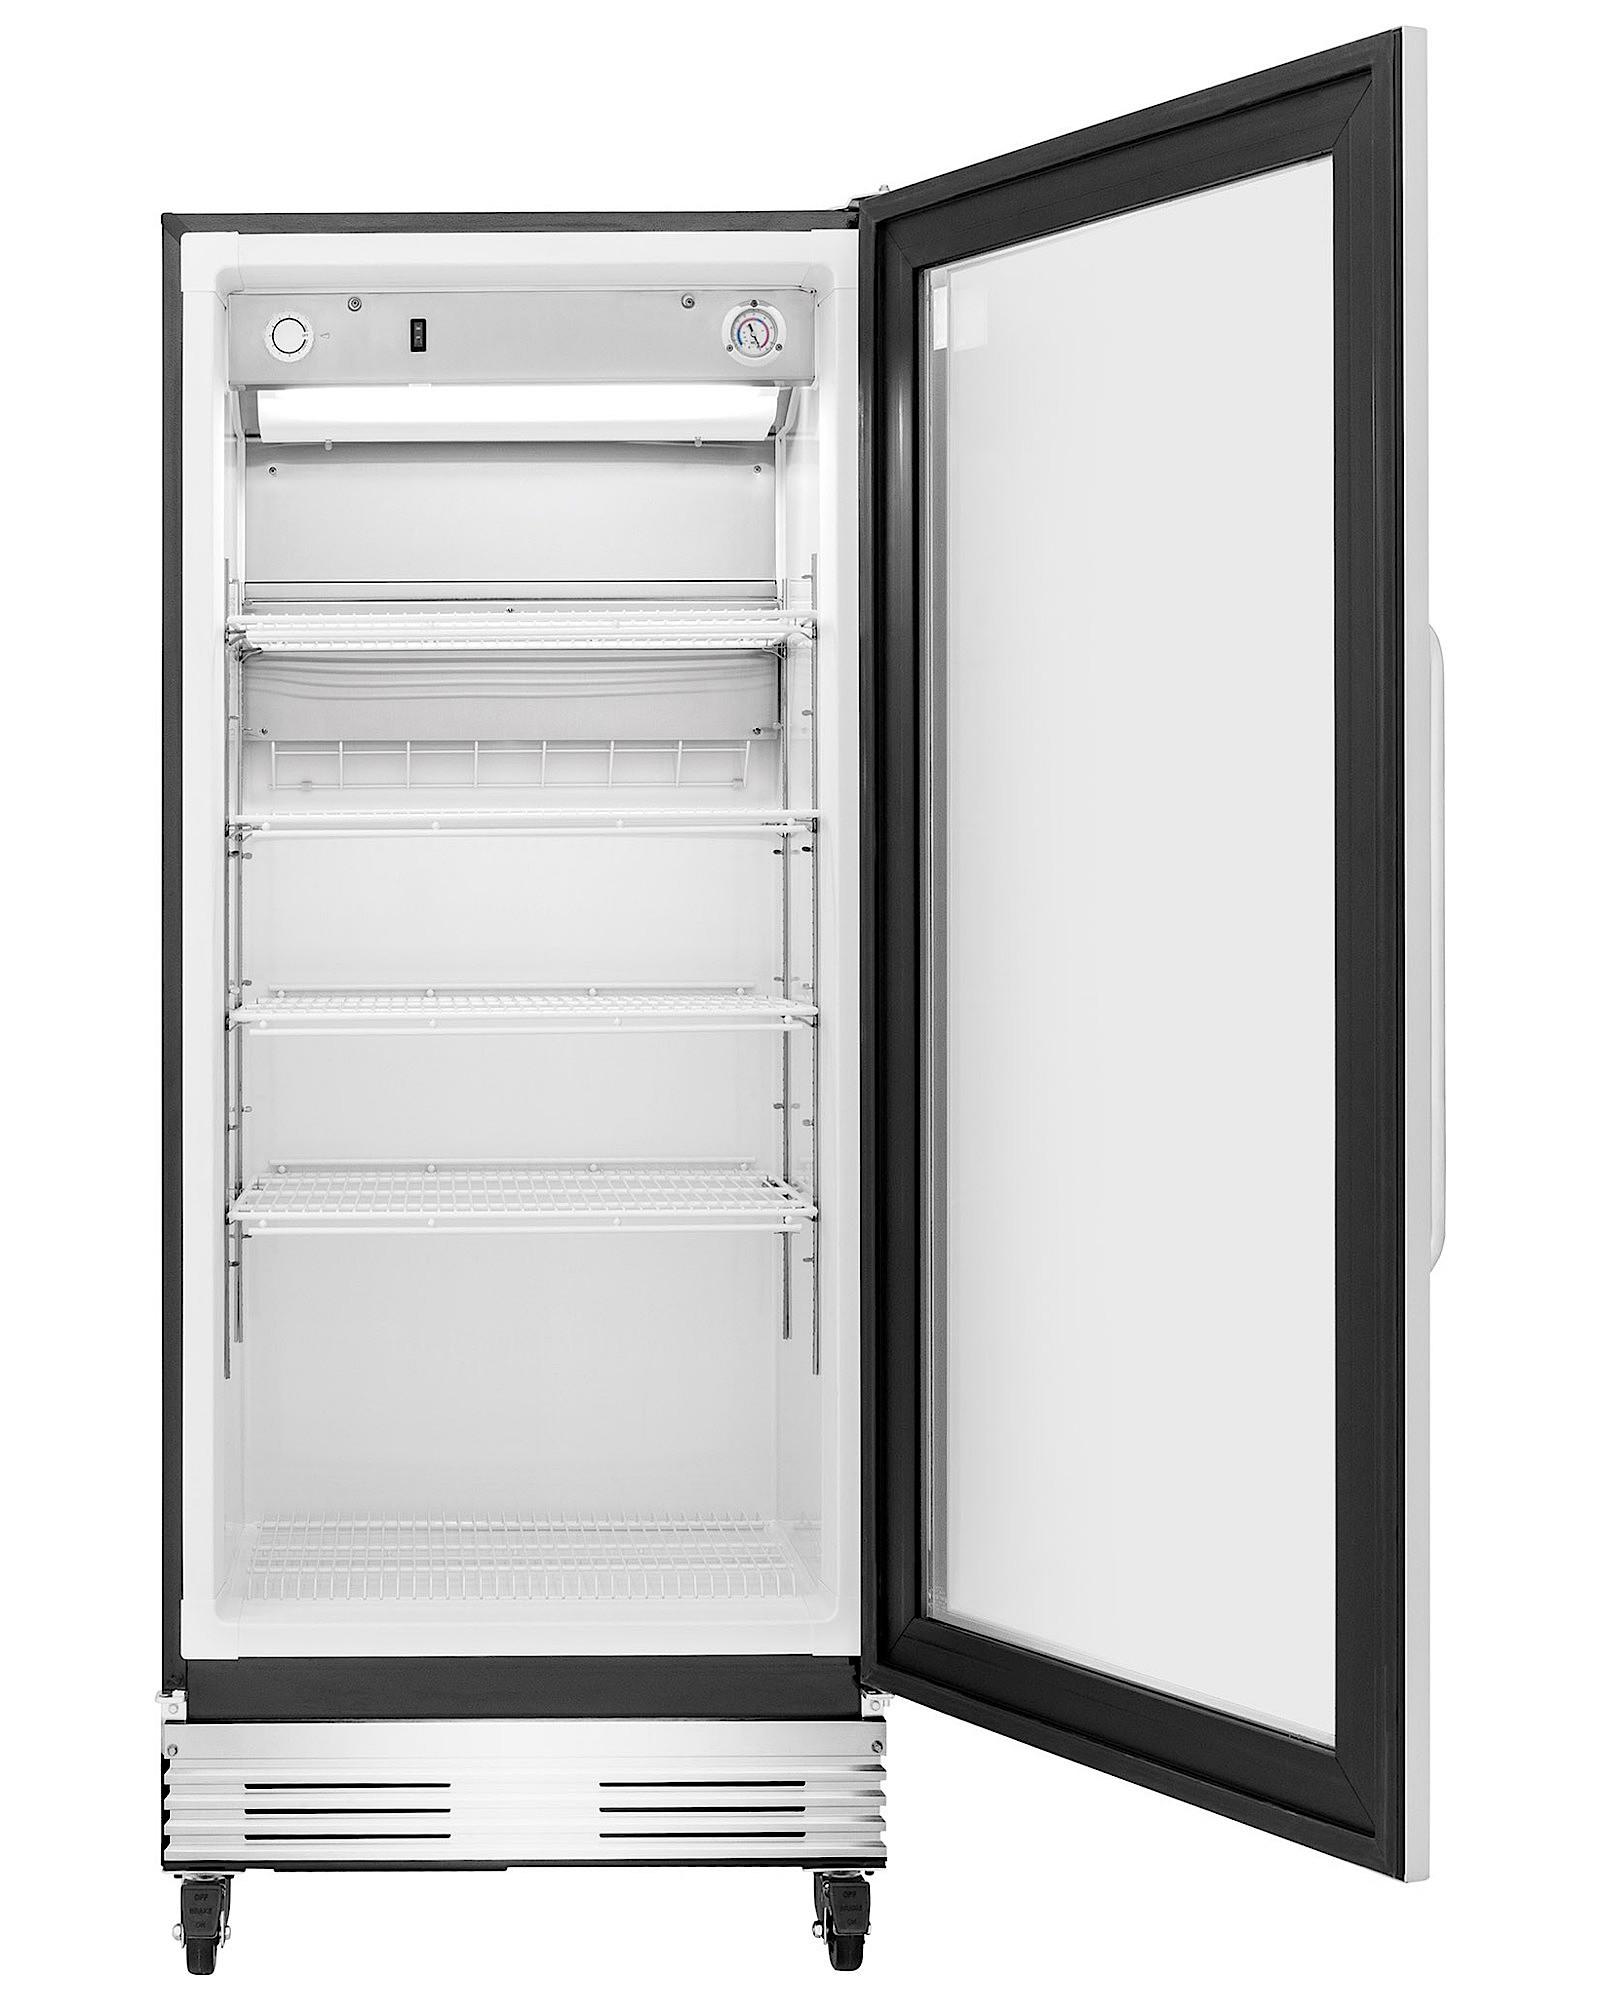 Frigidaire FCGM181RQB 18.4 cu. ft. Commercial Grade Glass Door Refrigerator - Stainless Steel